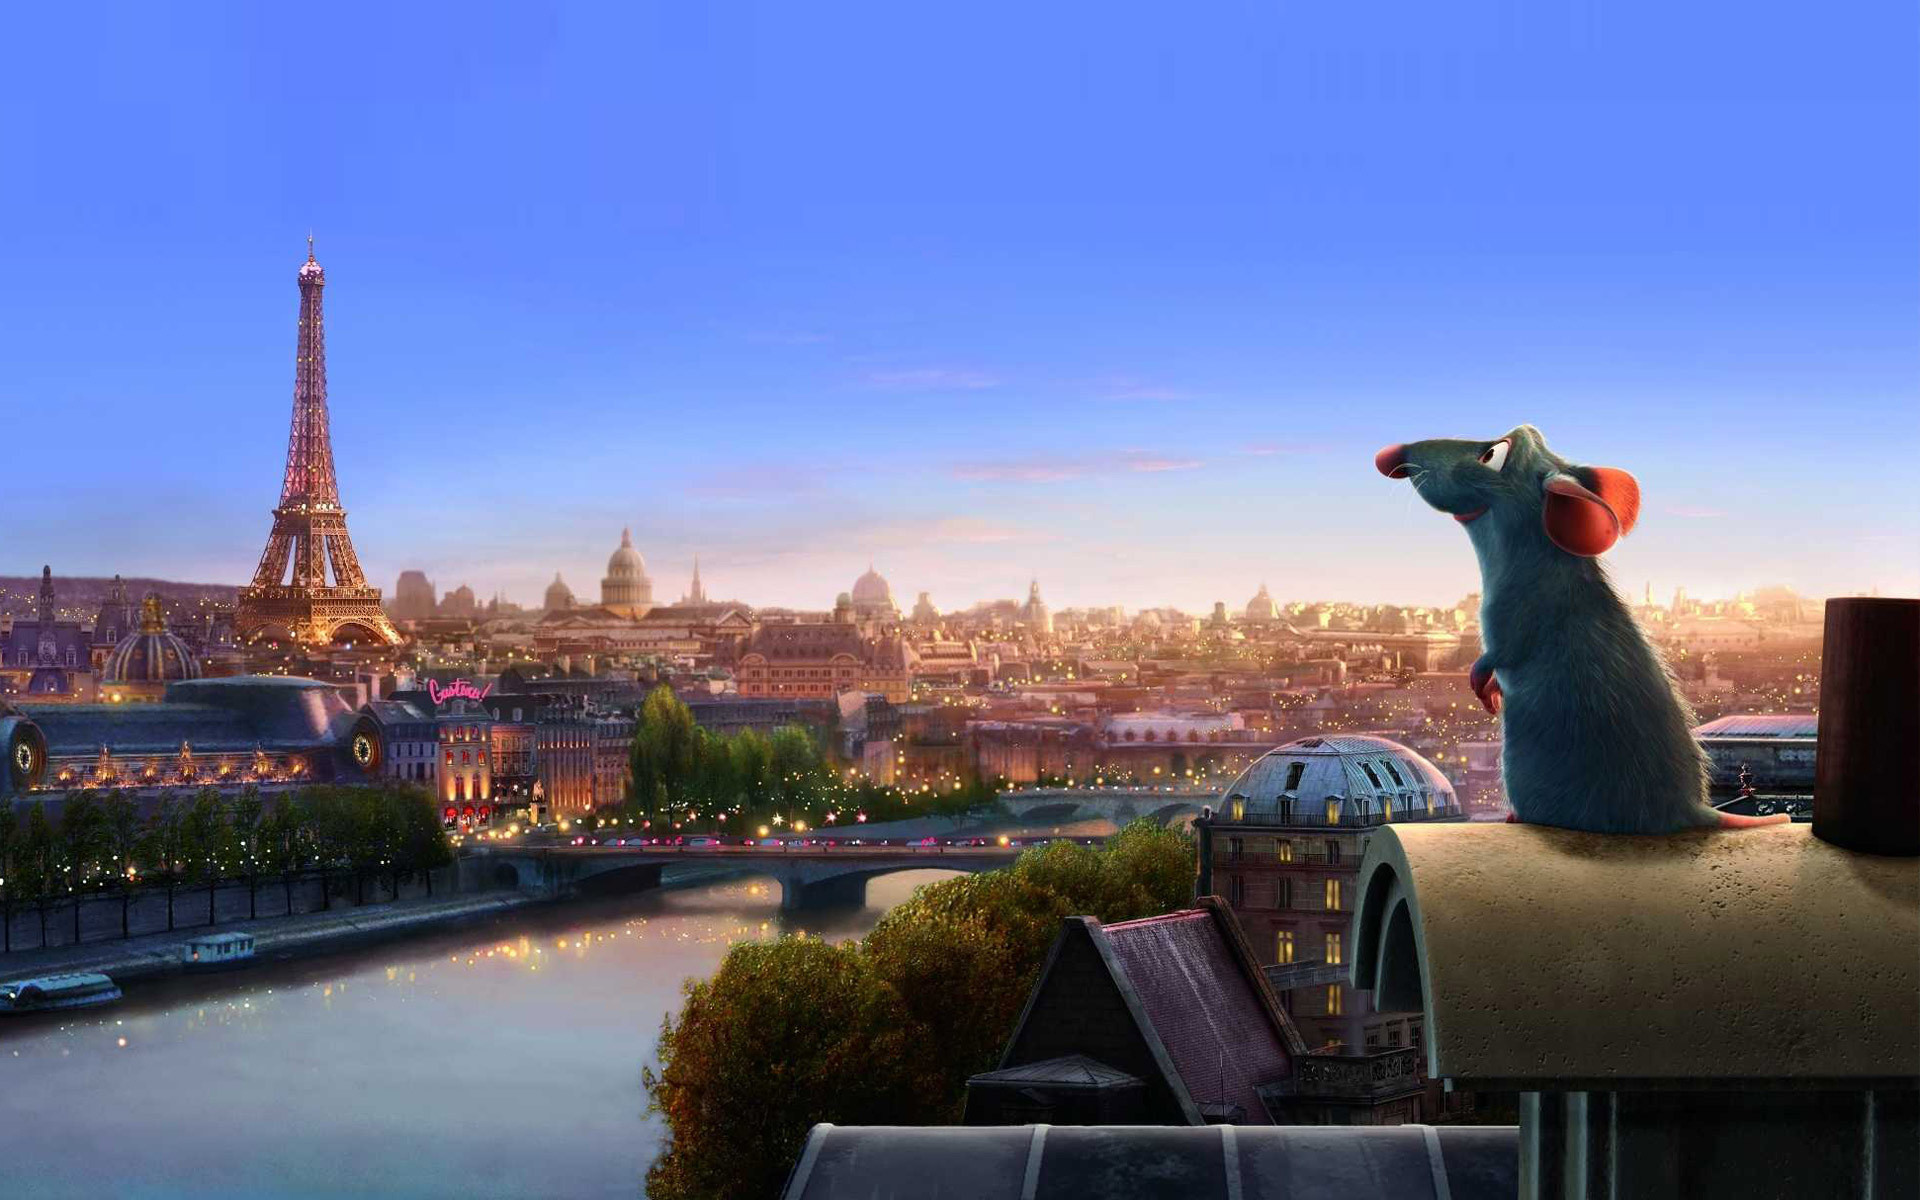 Wallpaper, myshenok, Paris, France, cartoon, disney, pixar .